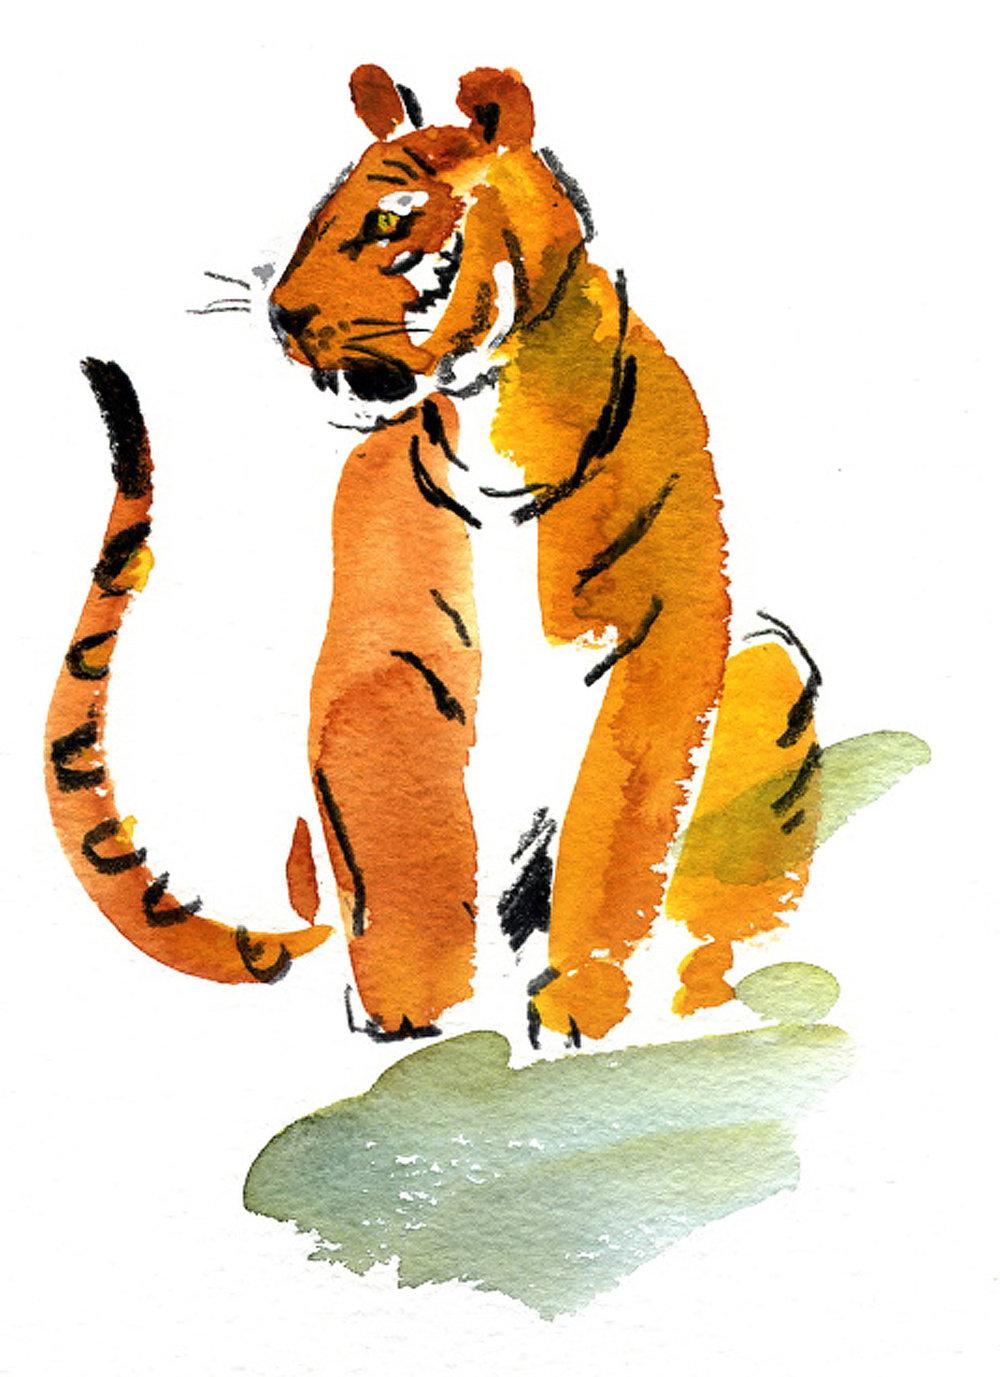 Tele.-Tiger-3_david_holmes.jpg